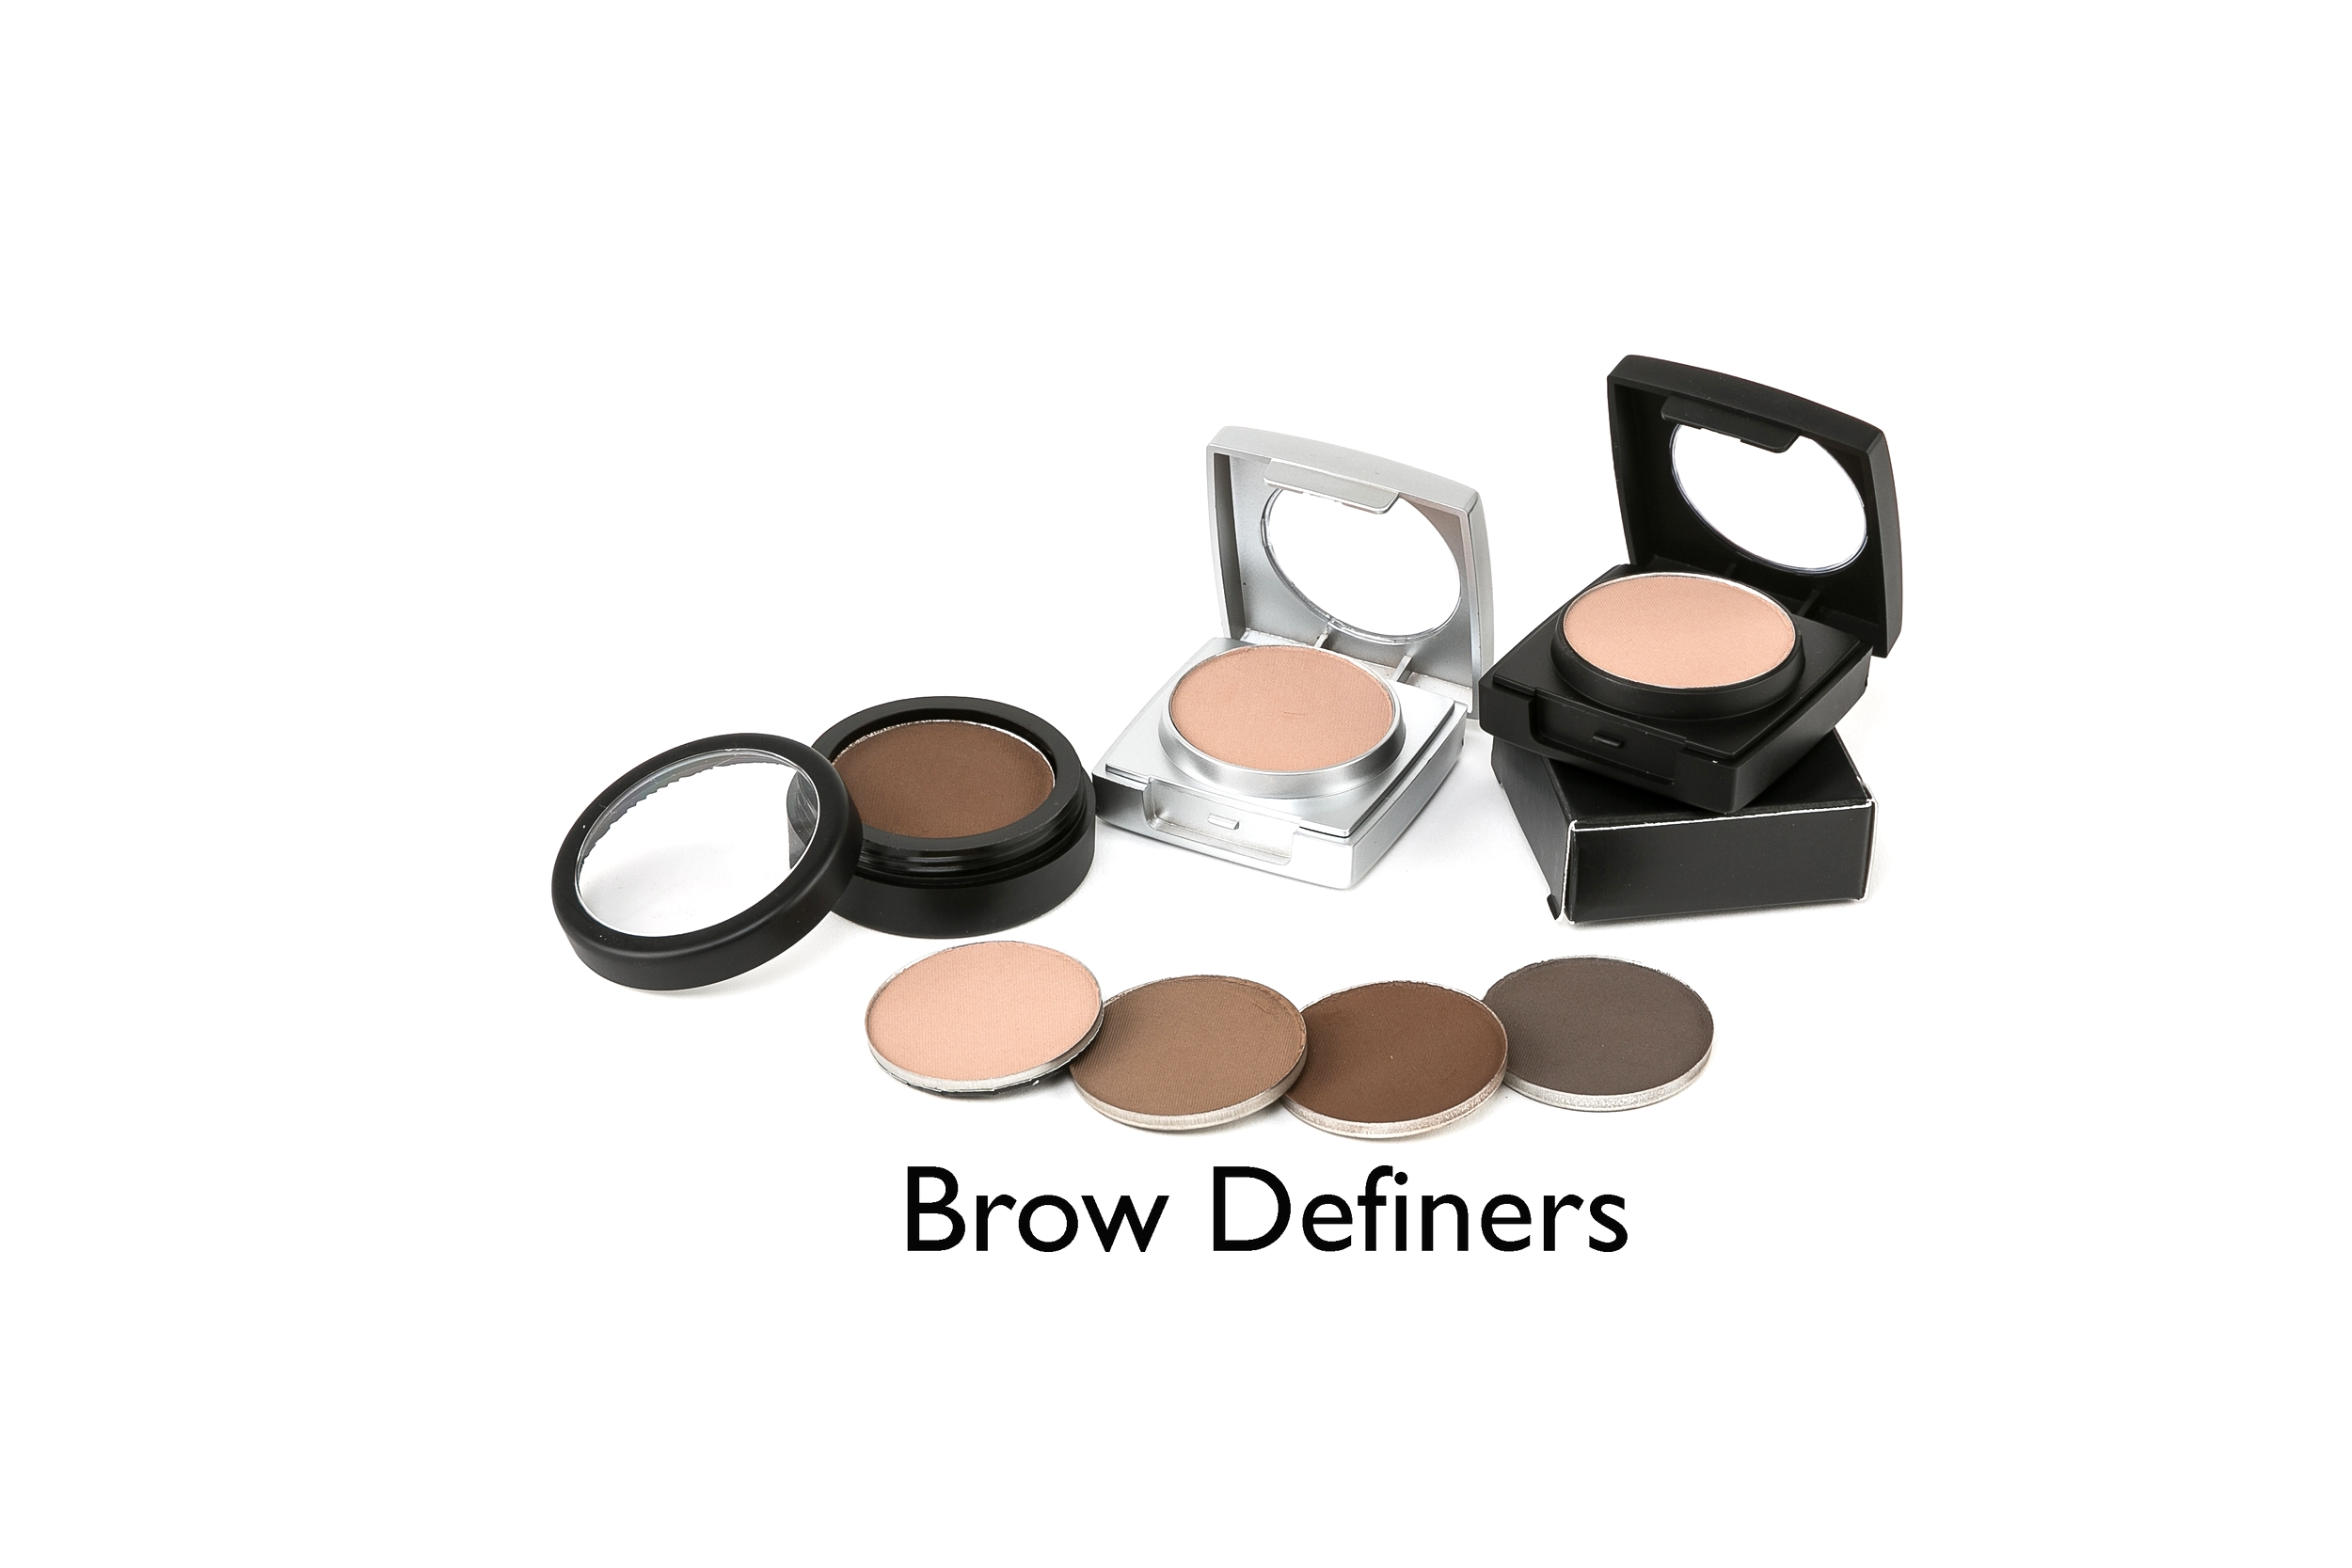 Brow Definers